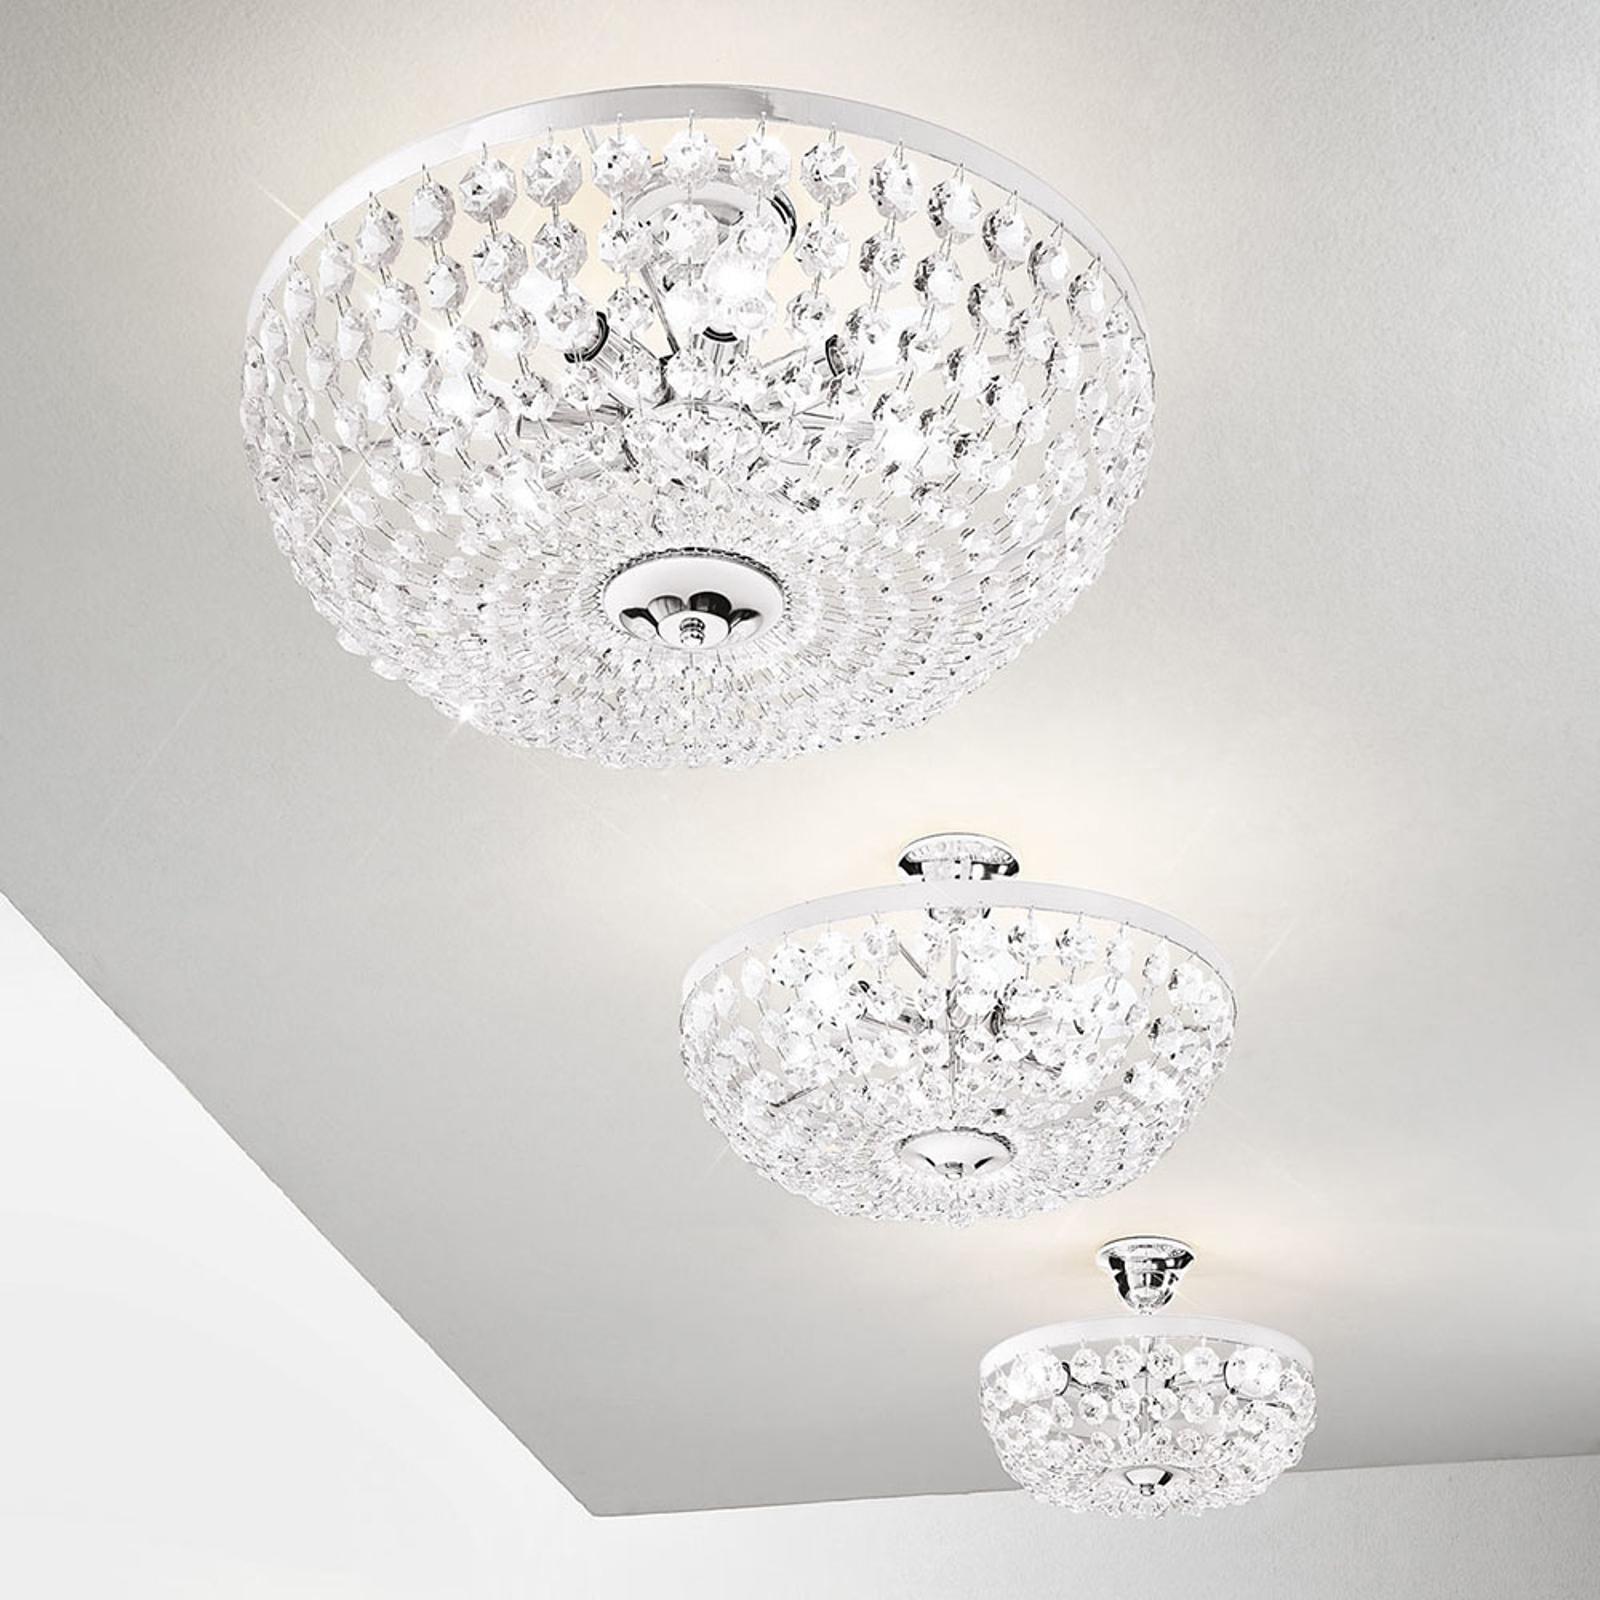 Lampa sufitowa Valerie, chrom, Ø 30 cm